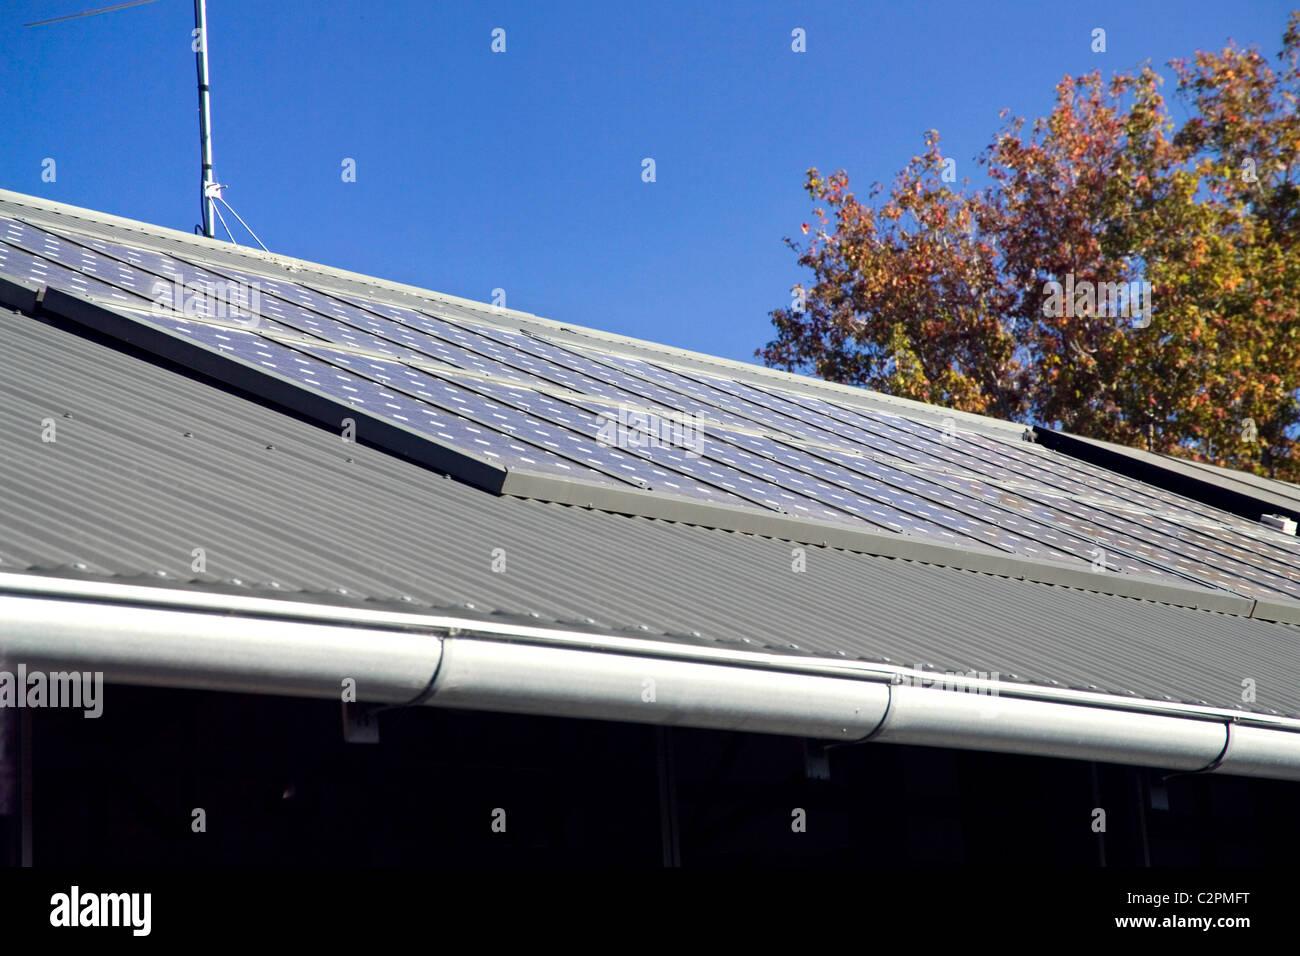 Caston House, Melbourne Australia. solar panels on the roof - Stock Image